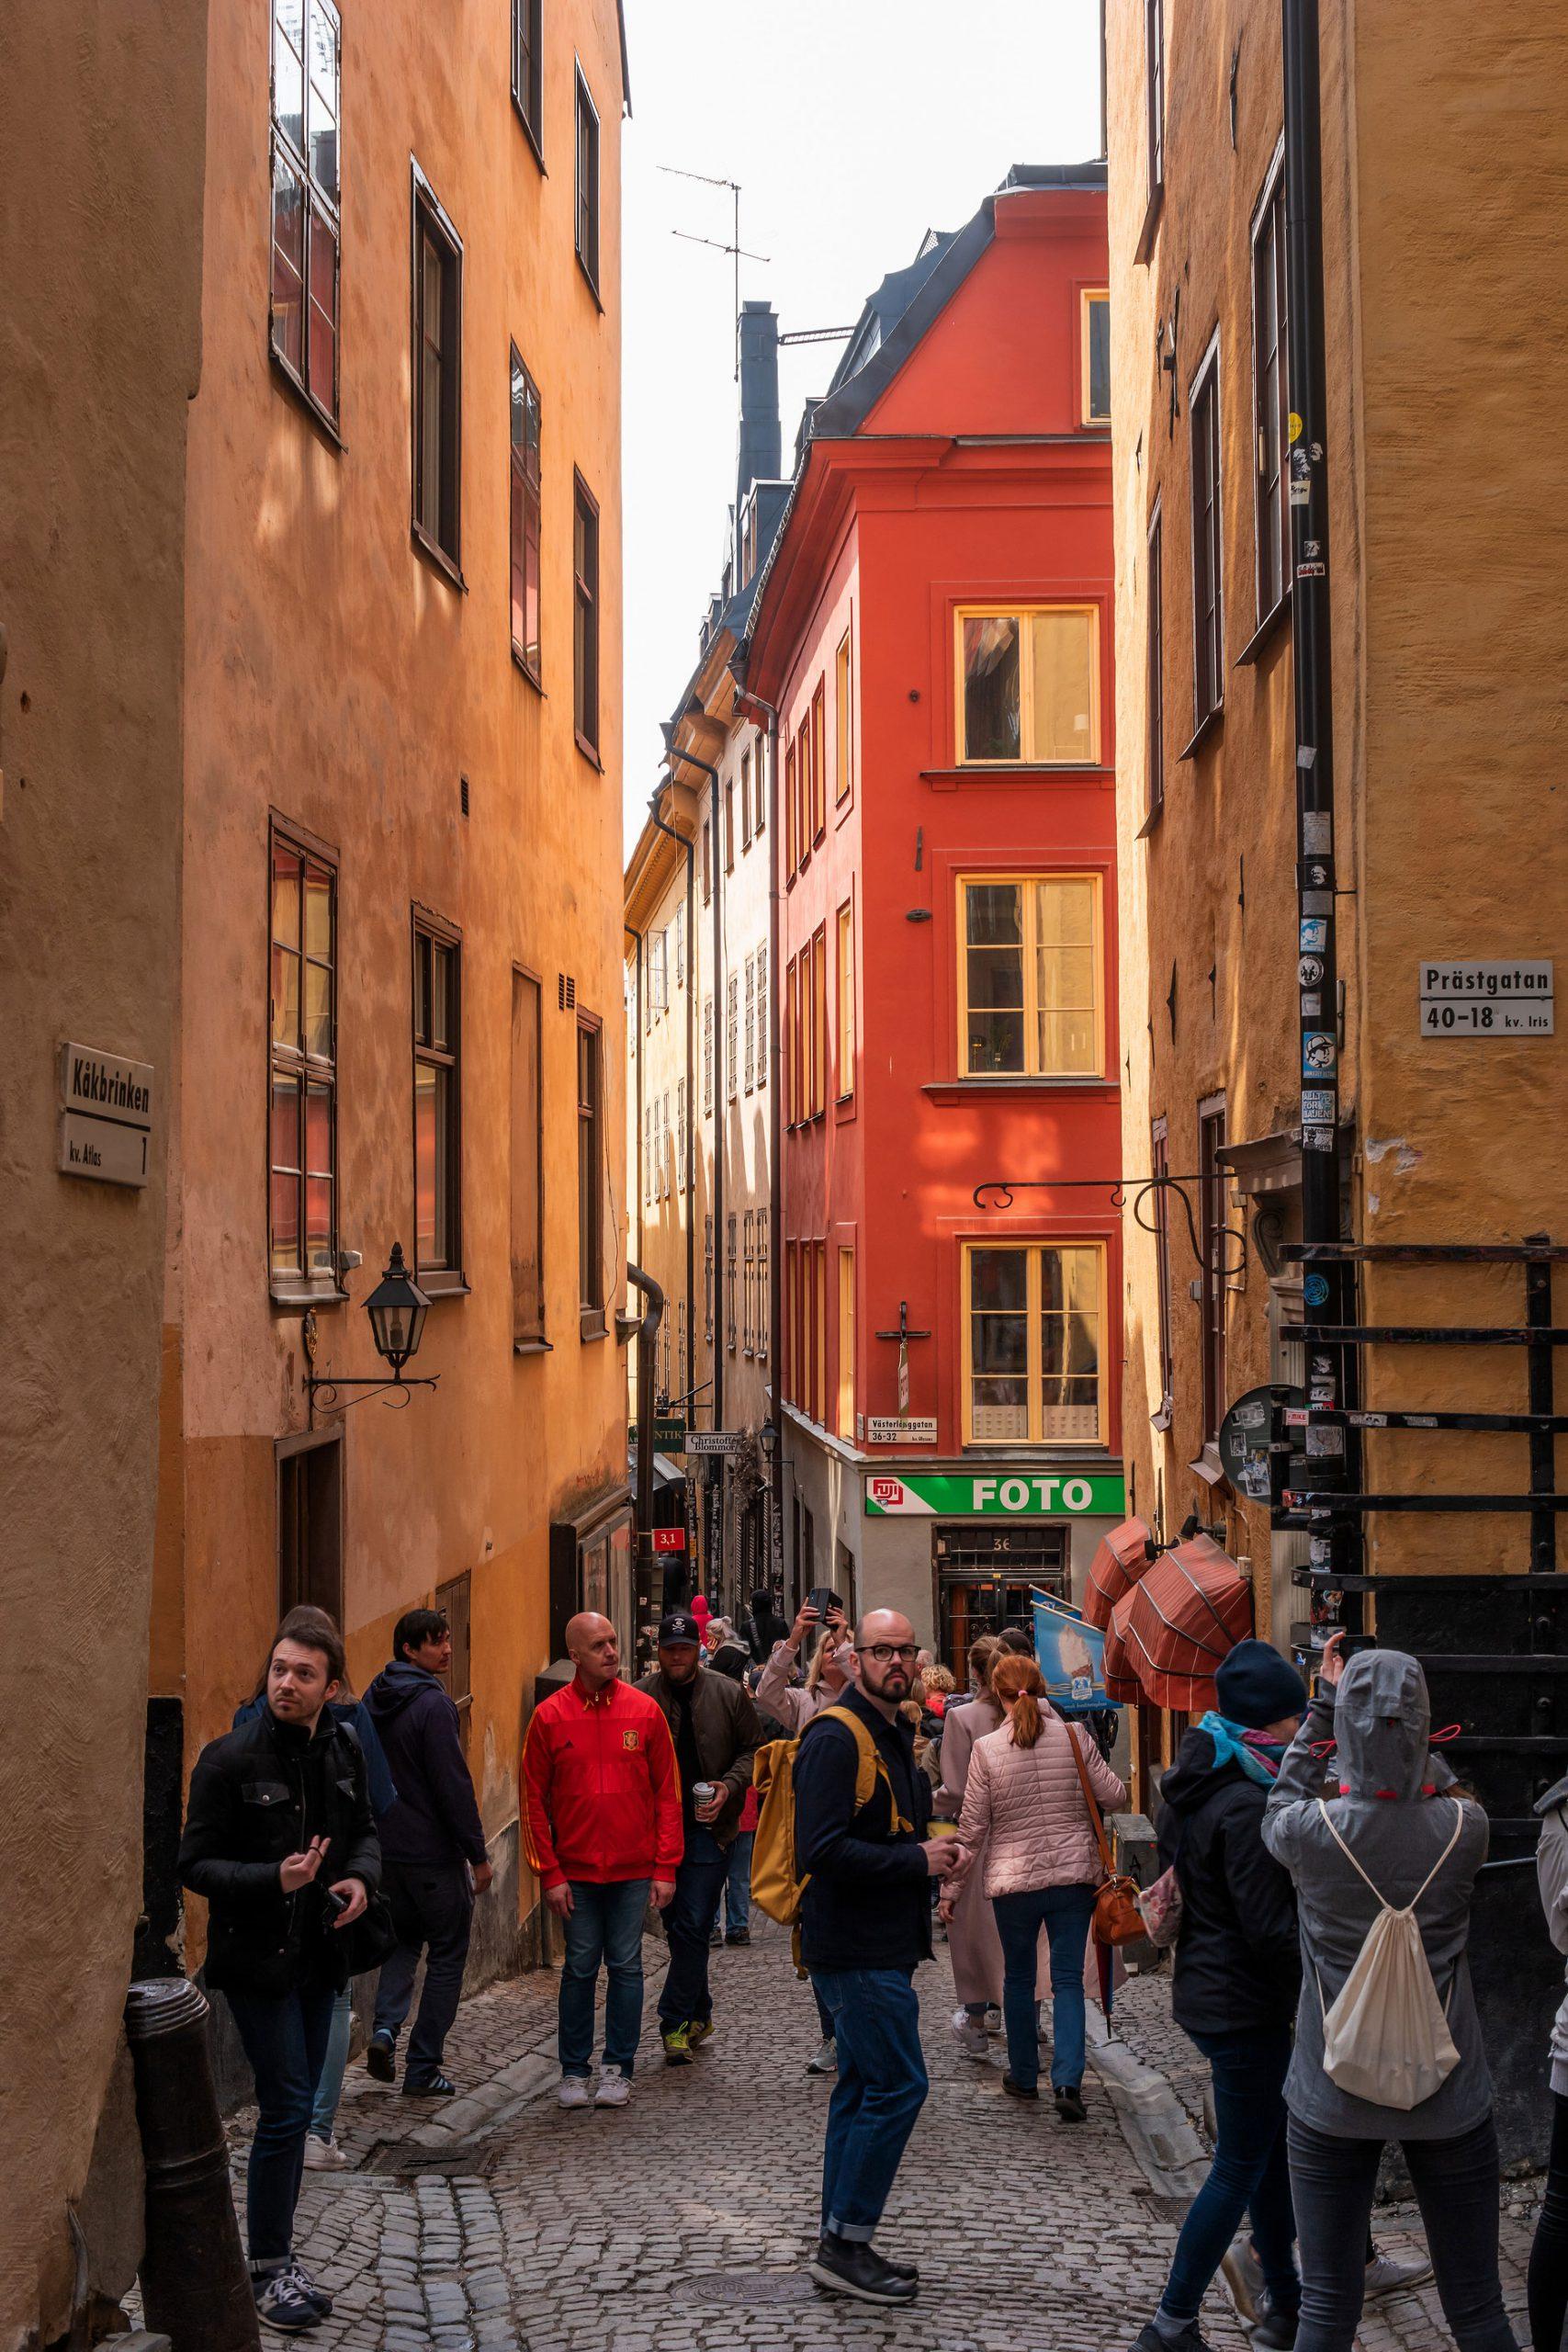 Gamla Stan Stockholm butikker byen smug